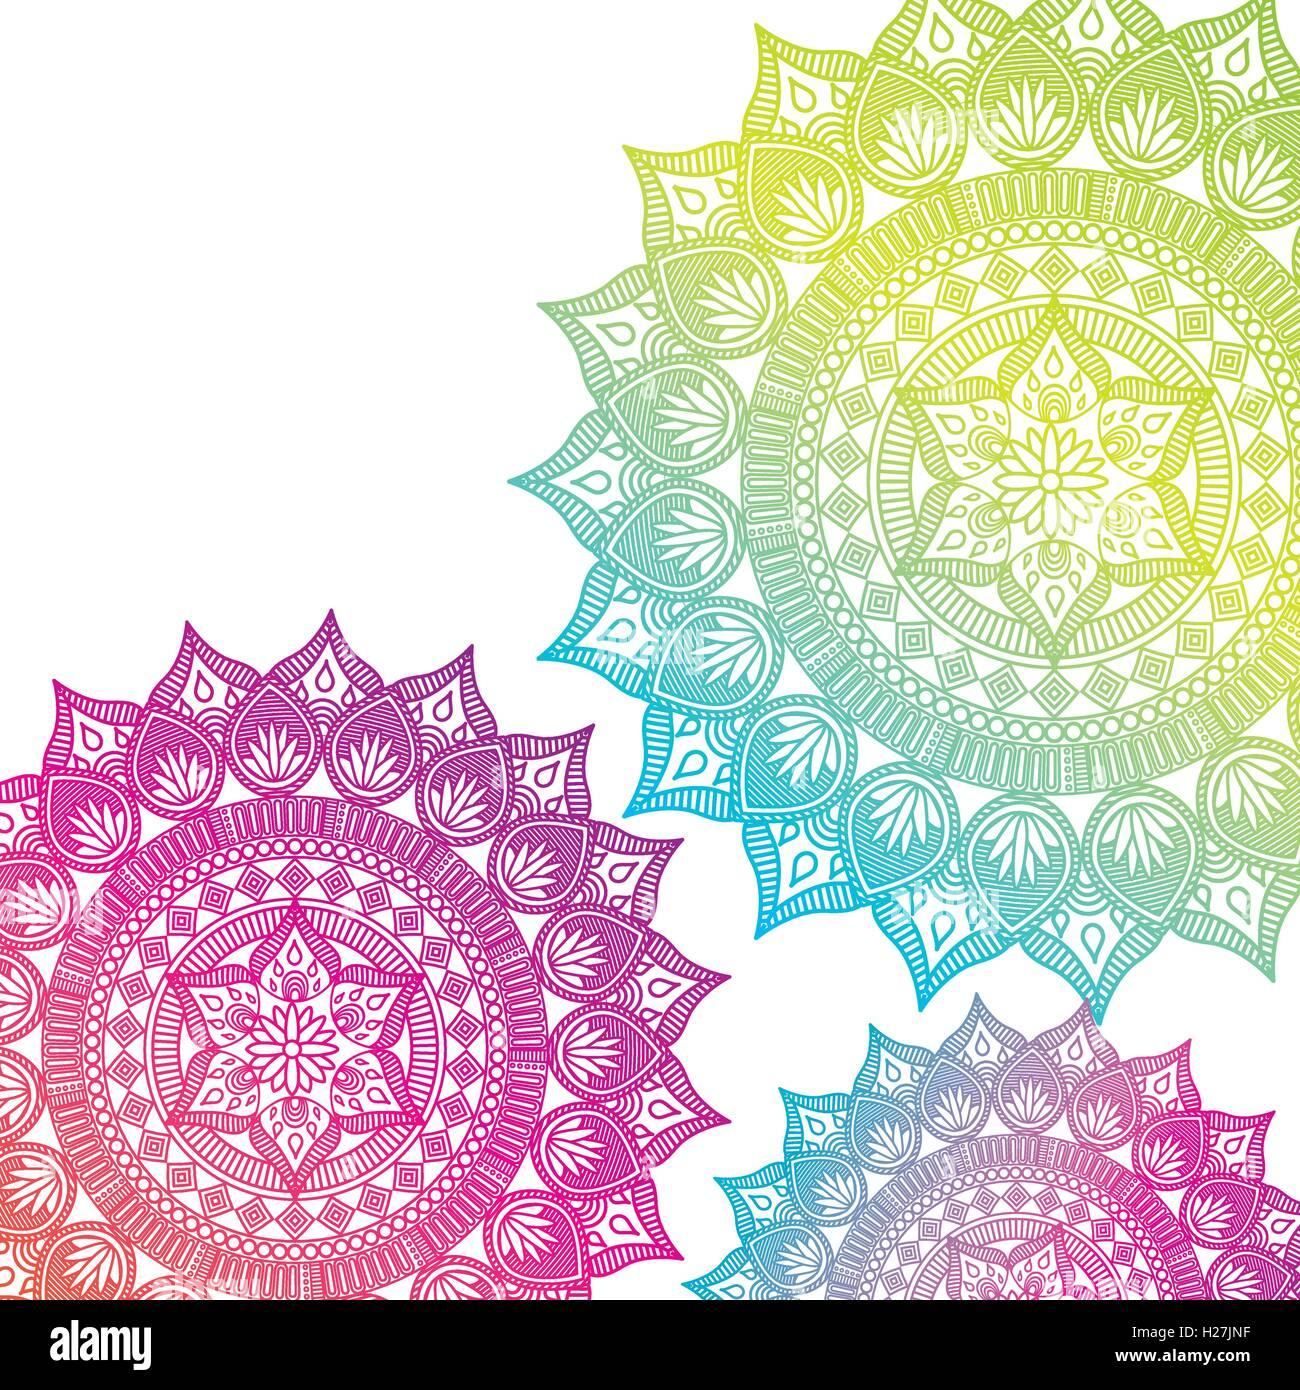 mandala india culture icon - Stock Image